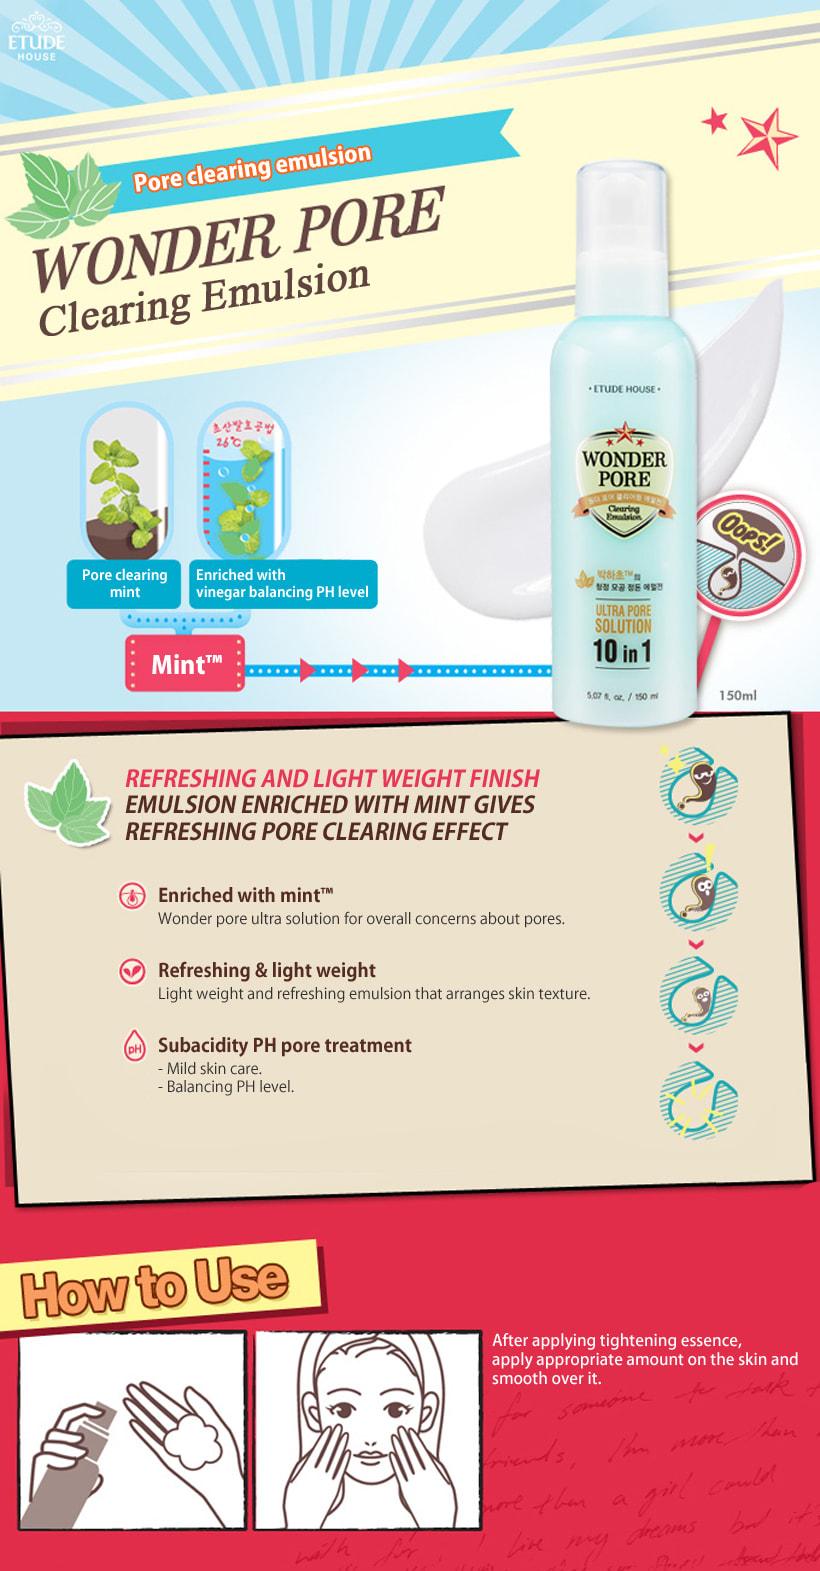 Wonder Pore Tightening Essence 50ml How to use description Ingredients